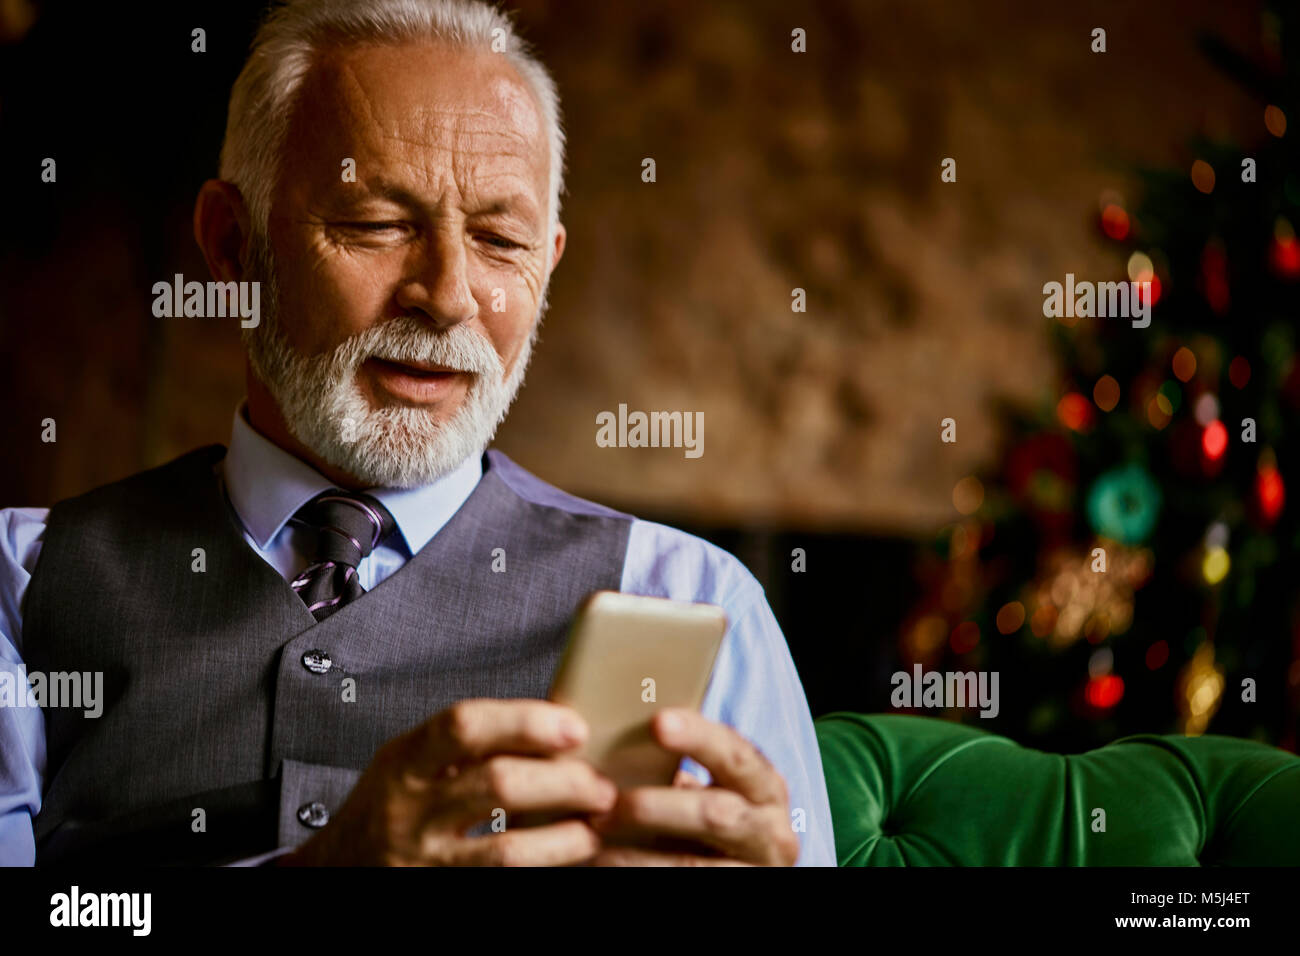 Elegante älterer Mann mit Handy Stockbild